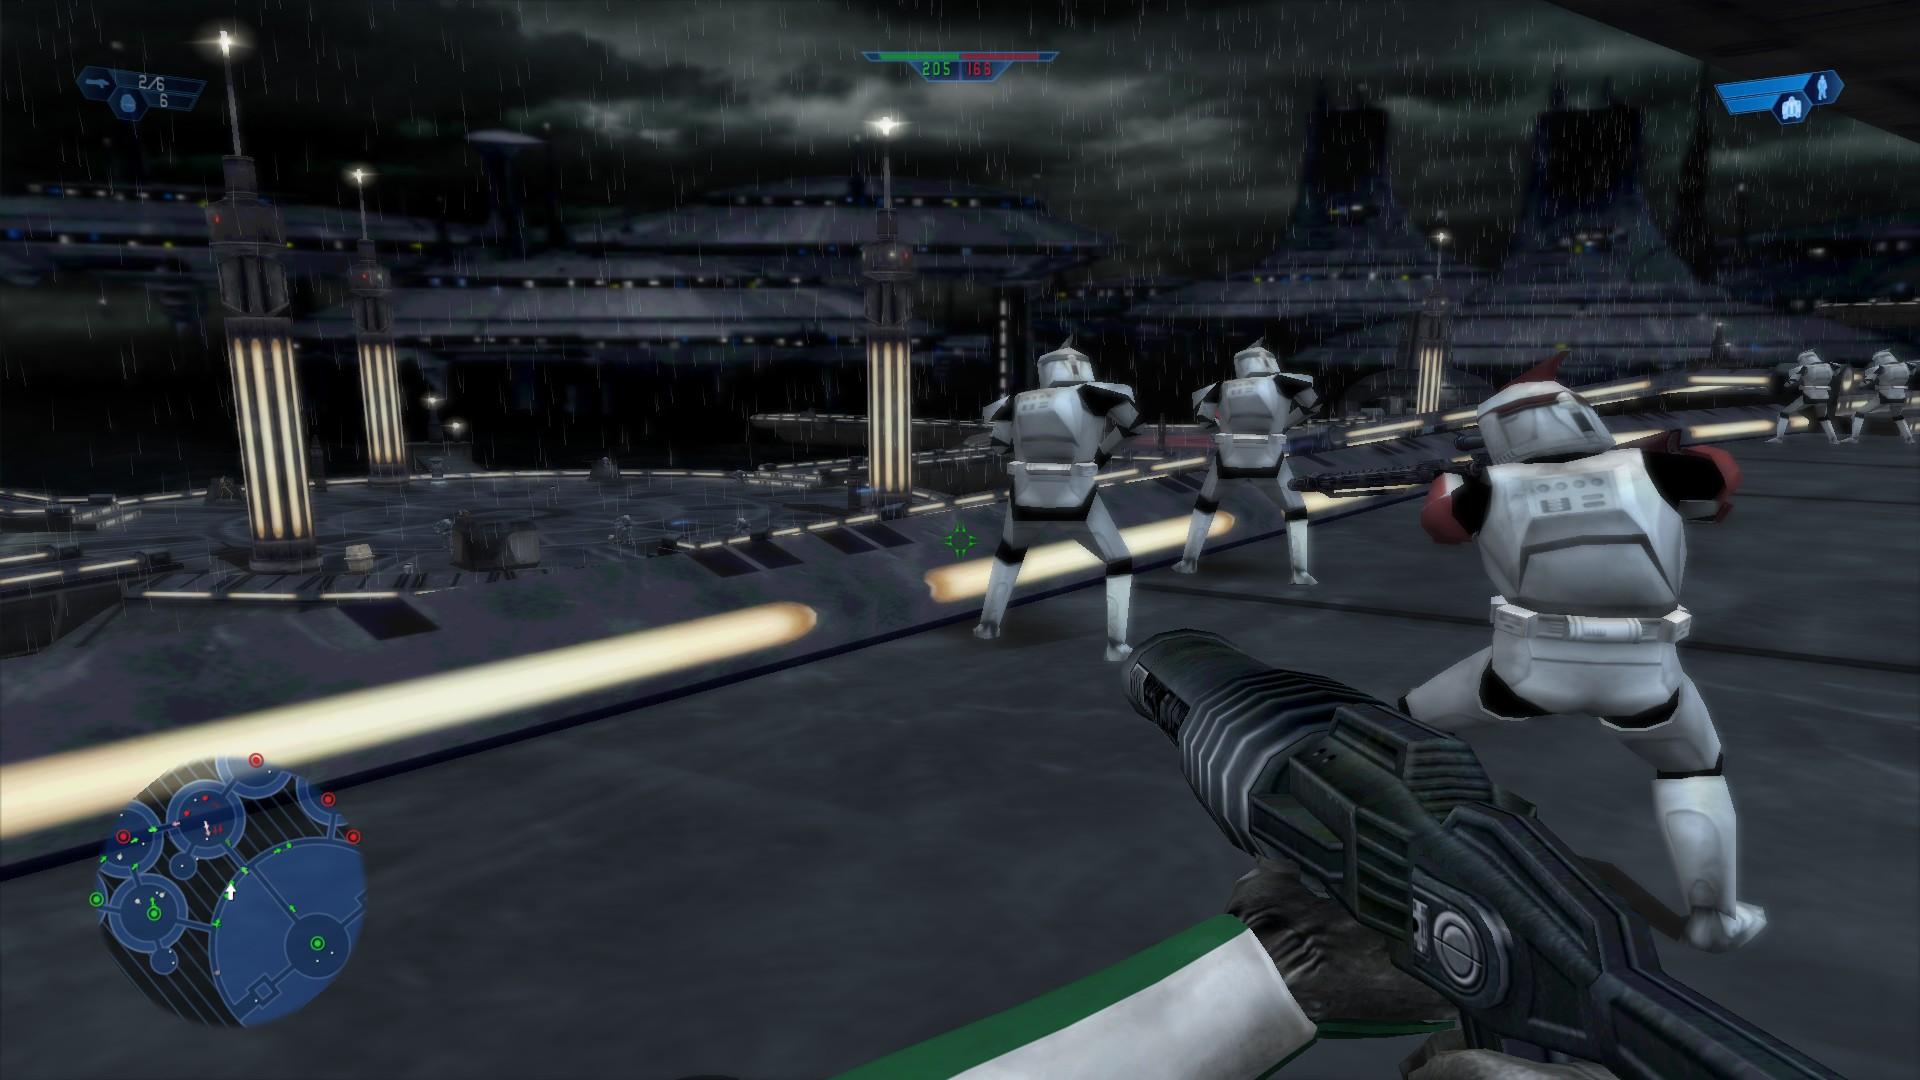 Star Wars Battlefront Classic 2004 Lutris